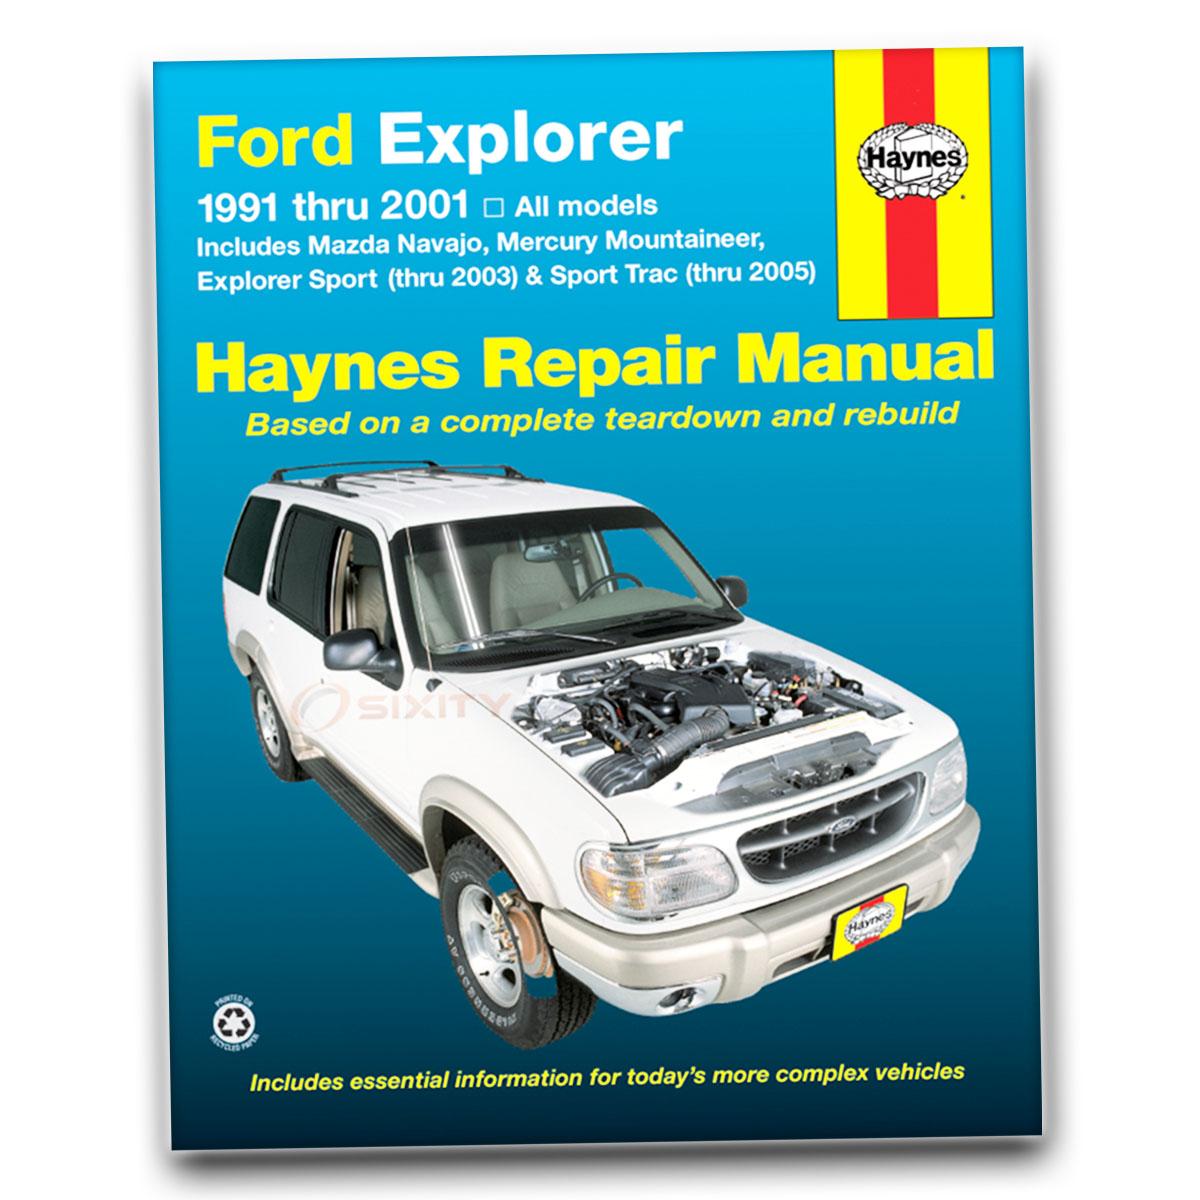 Haynes Repair Manual for Mazda Navajo DX LX Shop Service Garage Book lf